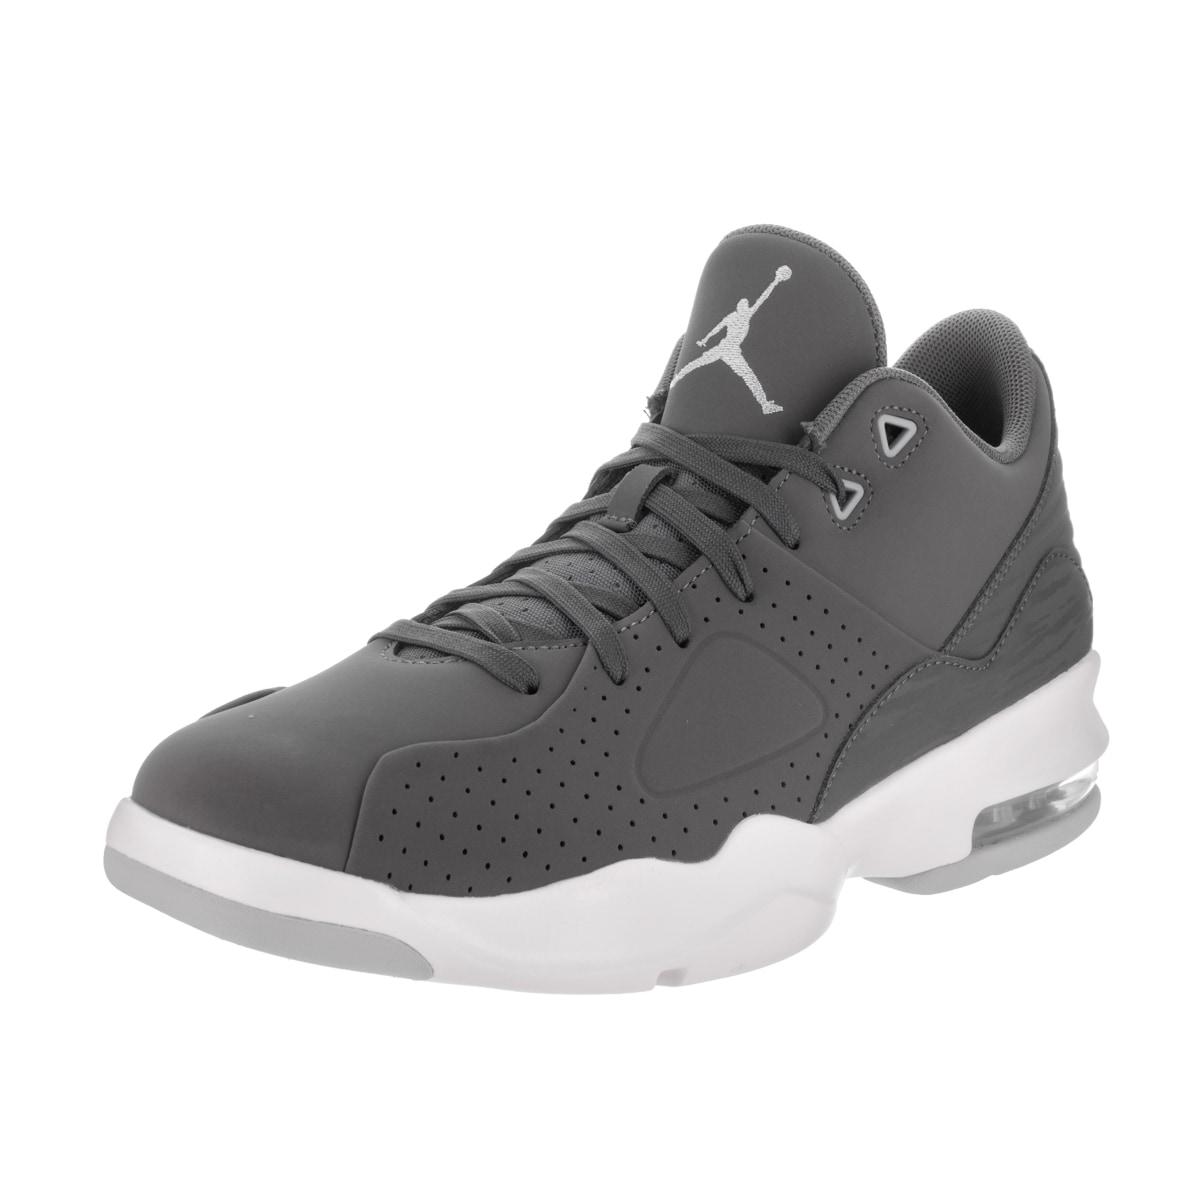 the best attitude ff80a 80d7f Shop Nike Jordan Men s Jordan Air Franchise Basketball Shoes - Free  Shipping Today - Overstock - 14442906